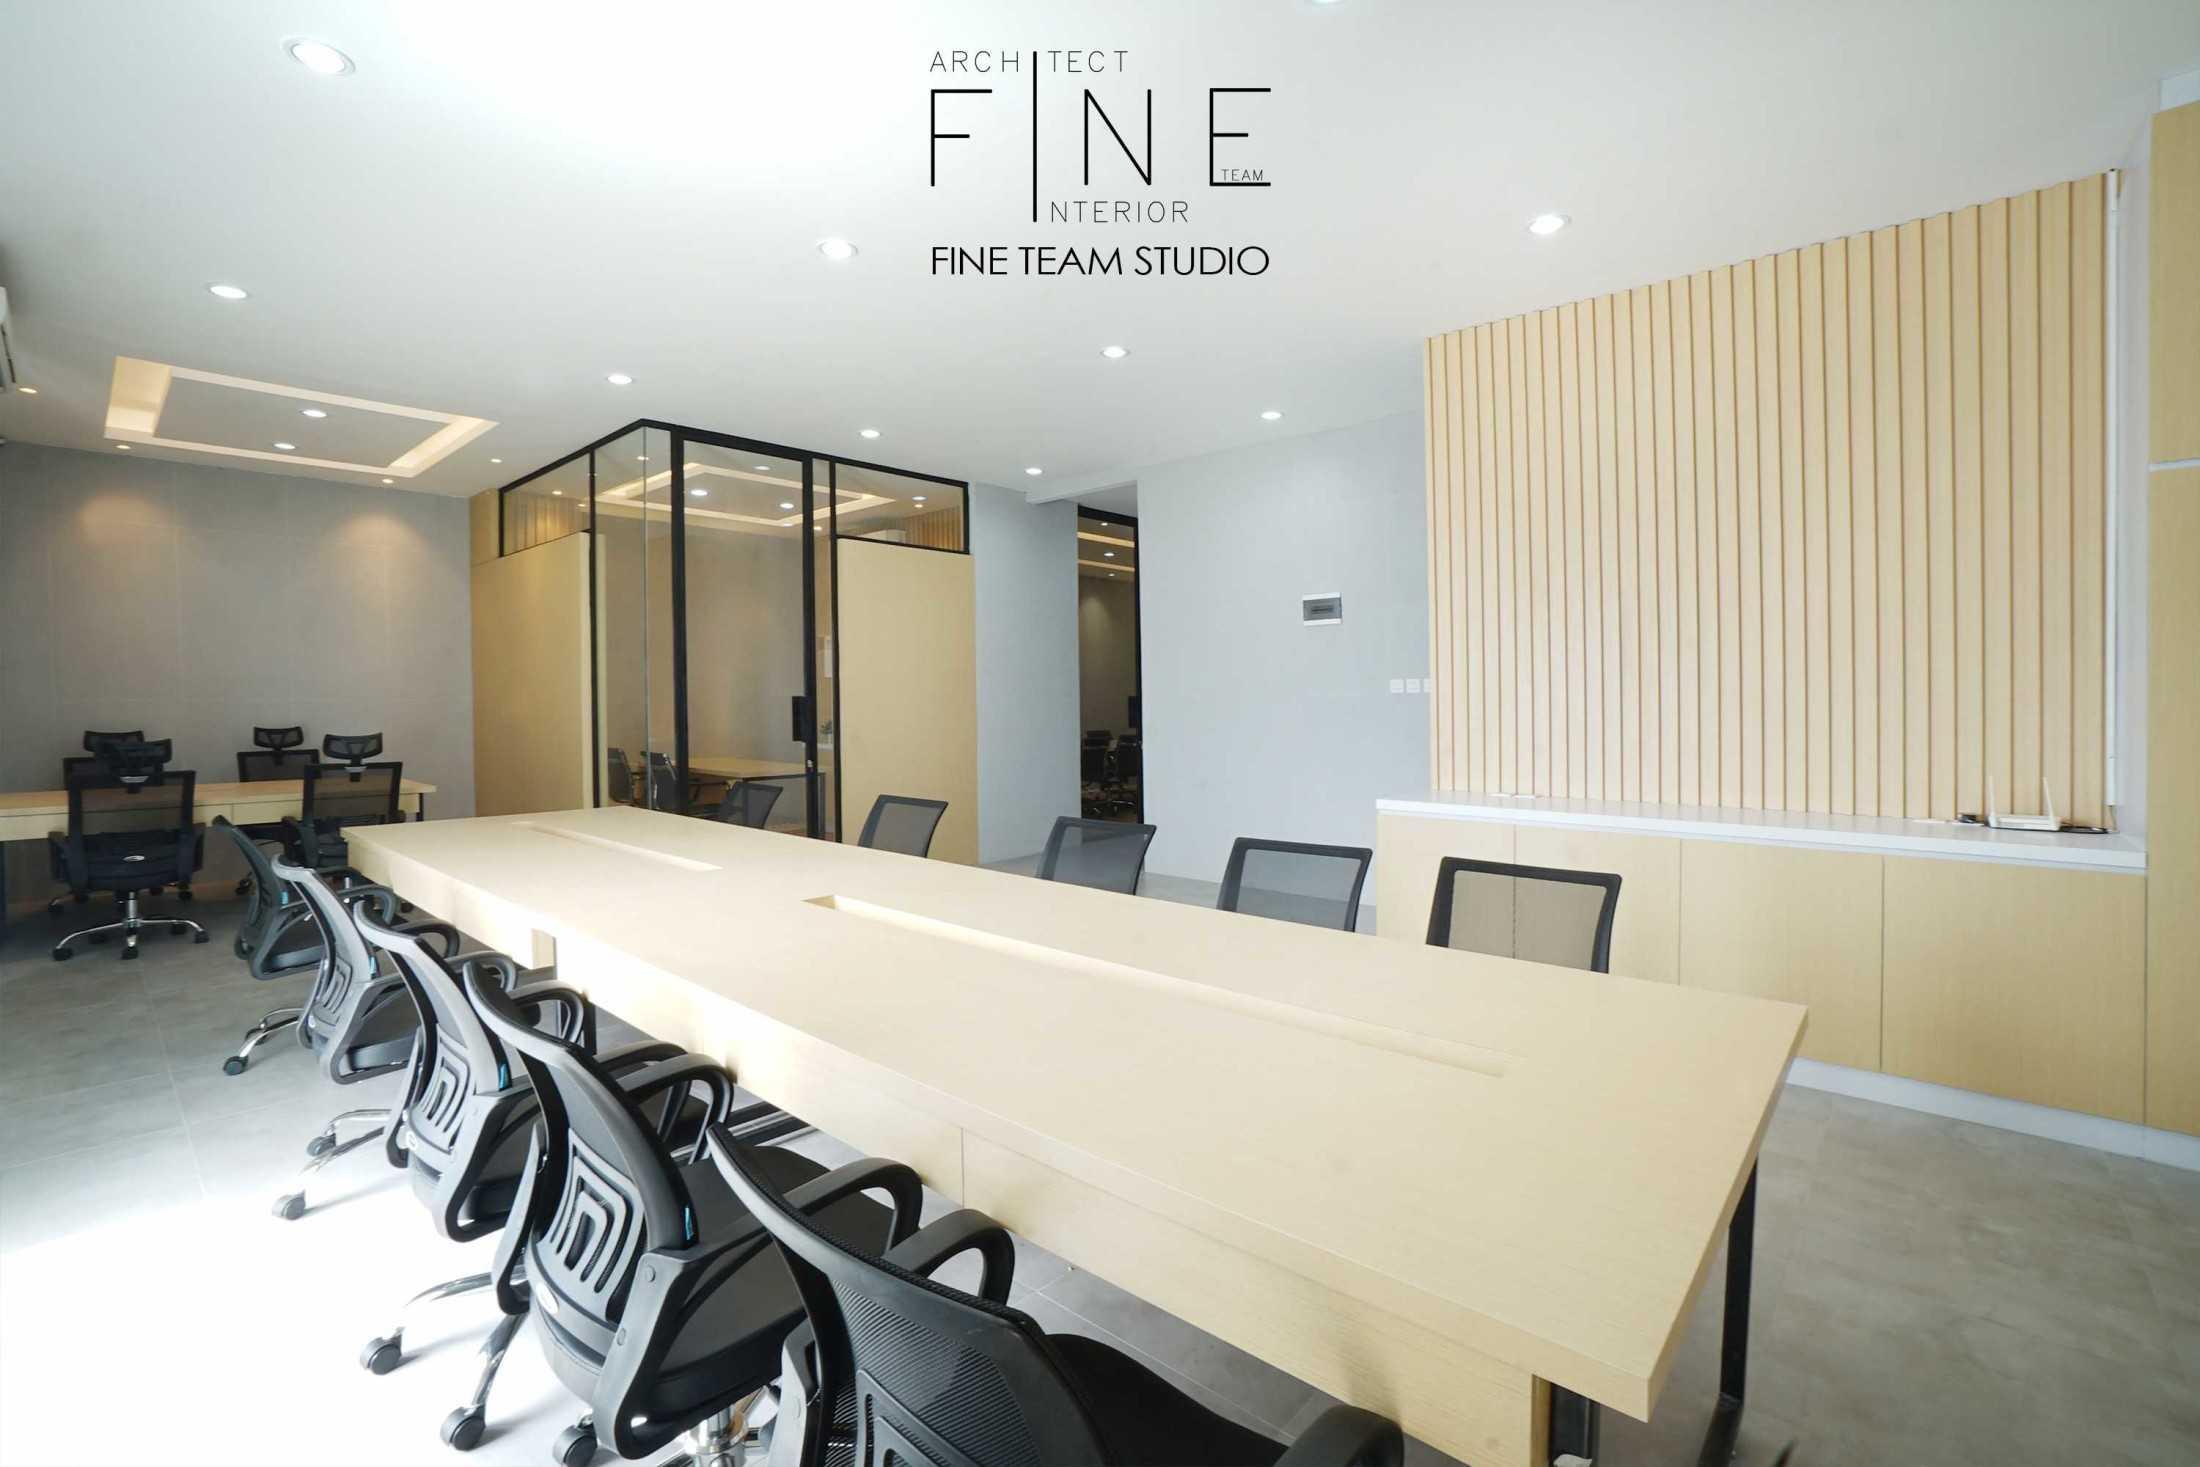 Fine Team Studio Mob Office Cikupa, Tangerang, Banten, Indonesia Cikupa, Tangerang, Banten, Indonesia Fine-Team-Studio-Mob-Office  71124